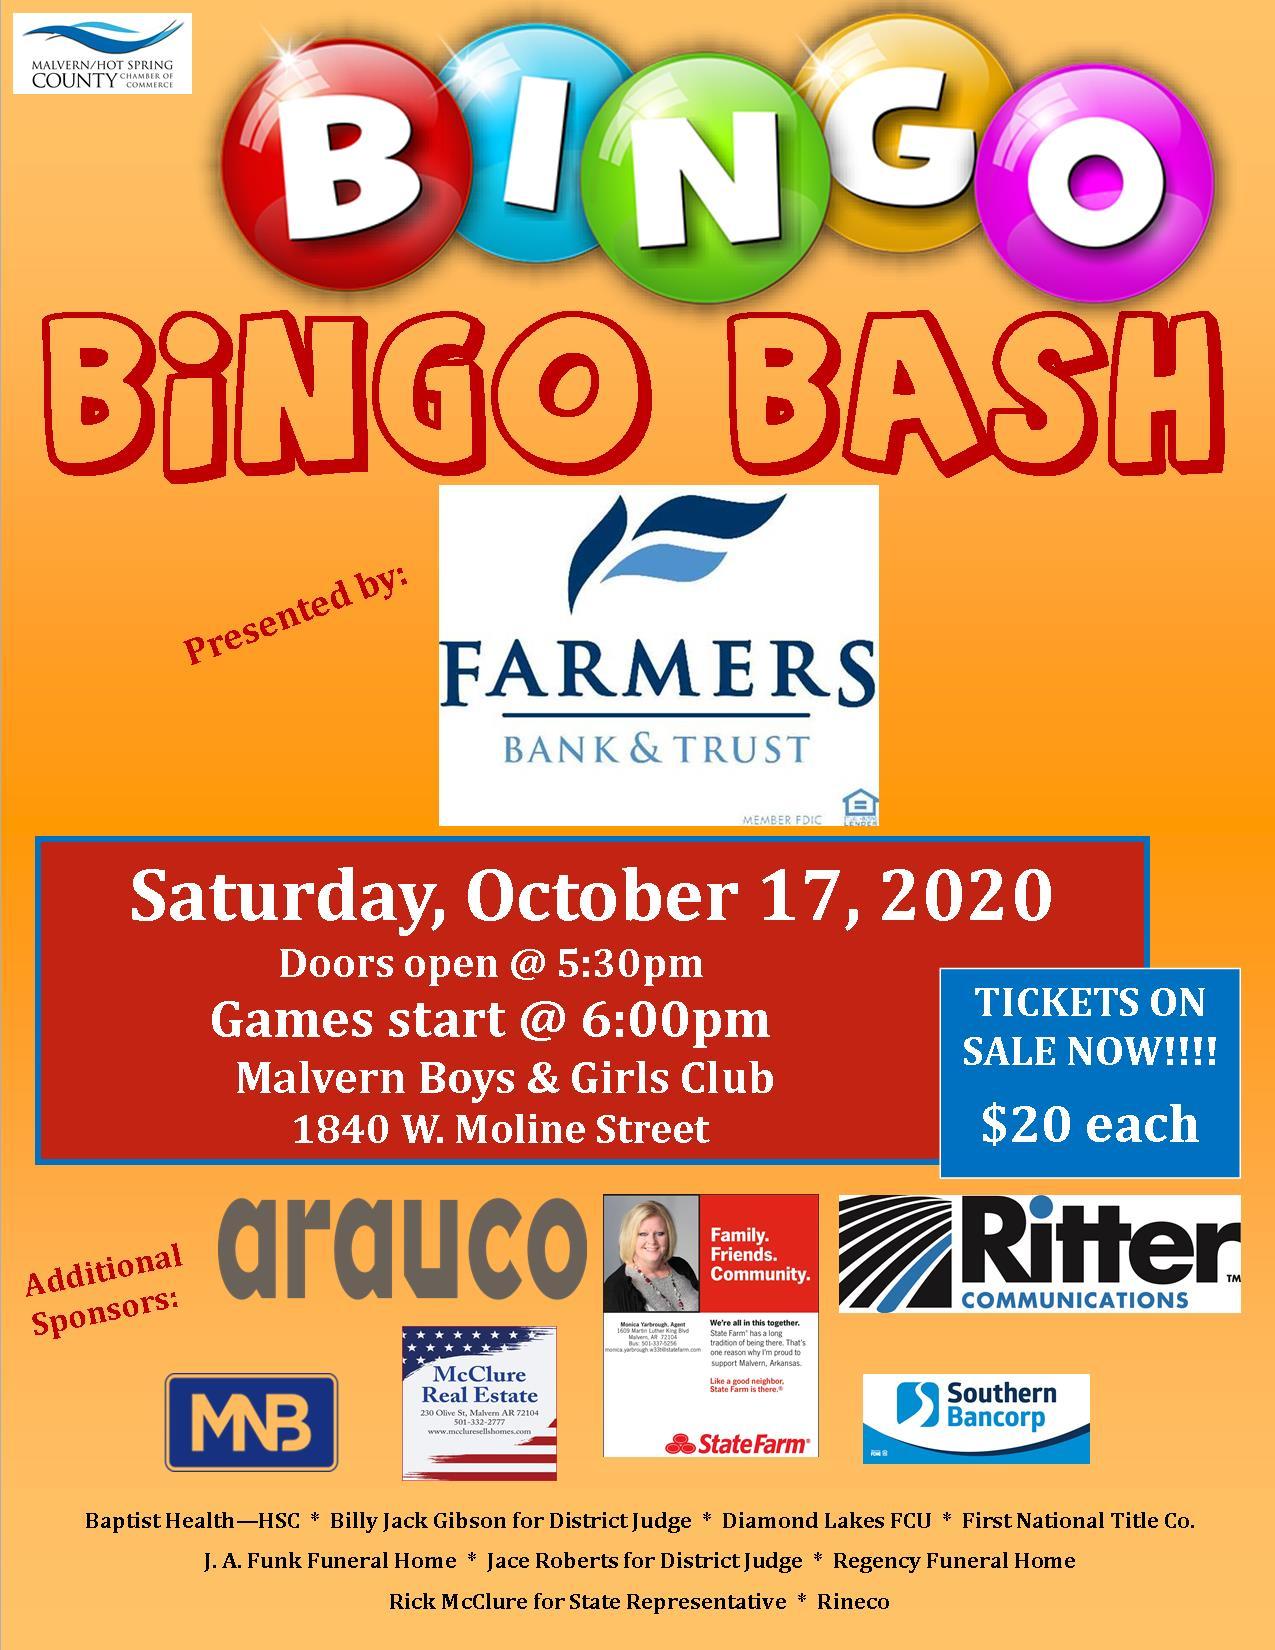 Bingo-Flyer-with-Sponsors-2018---first-batch-of-sponsors.jpg